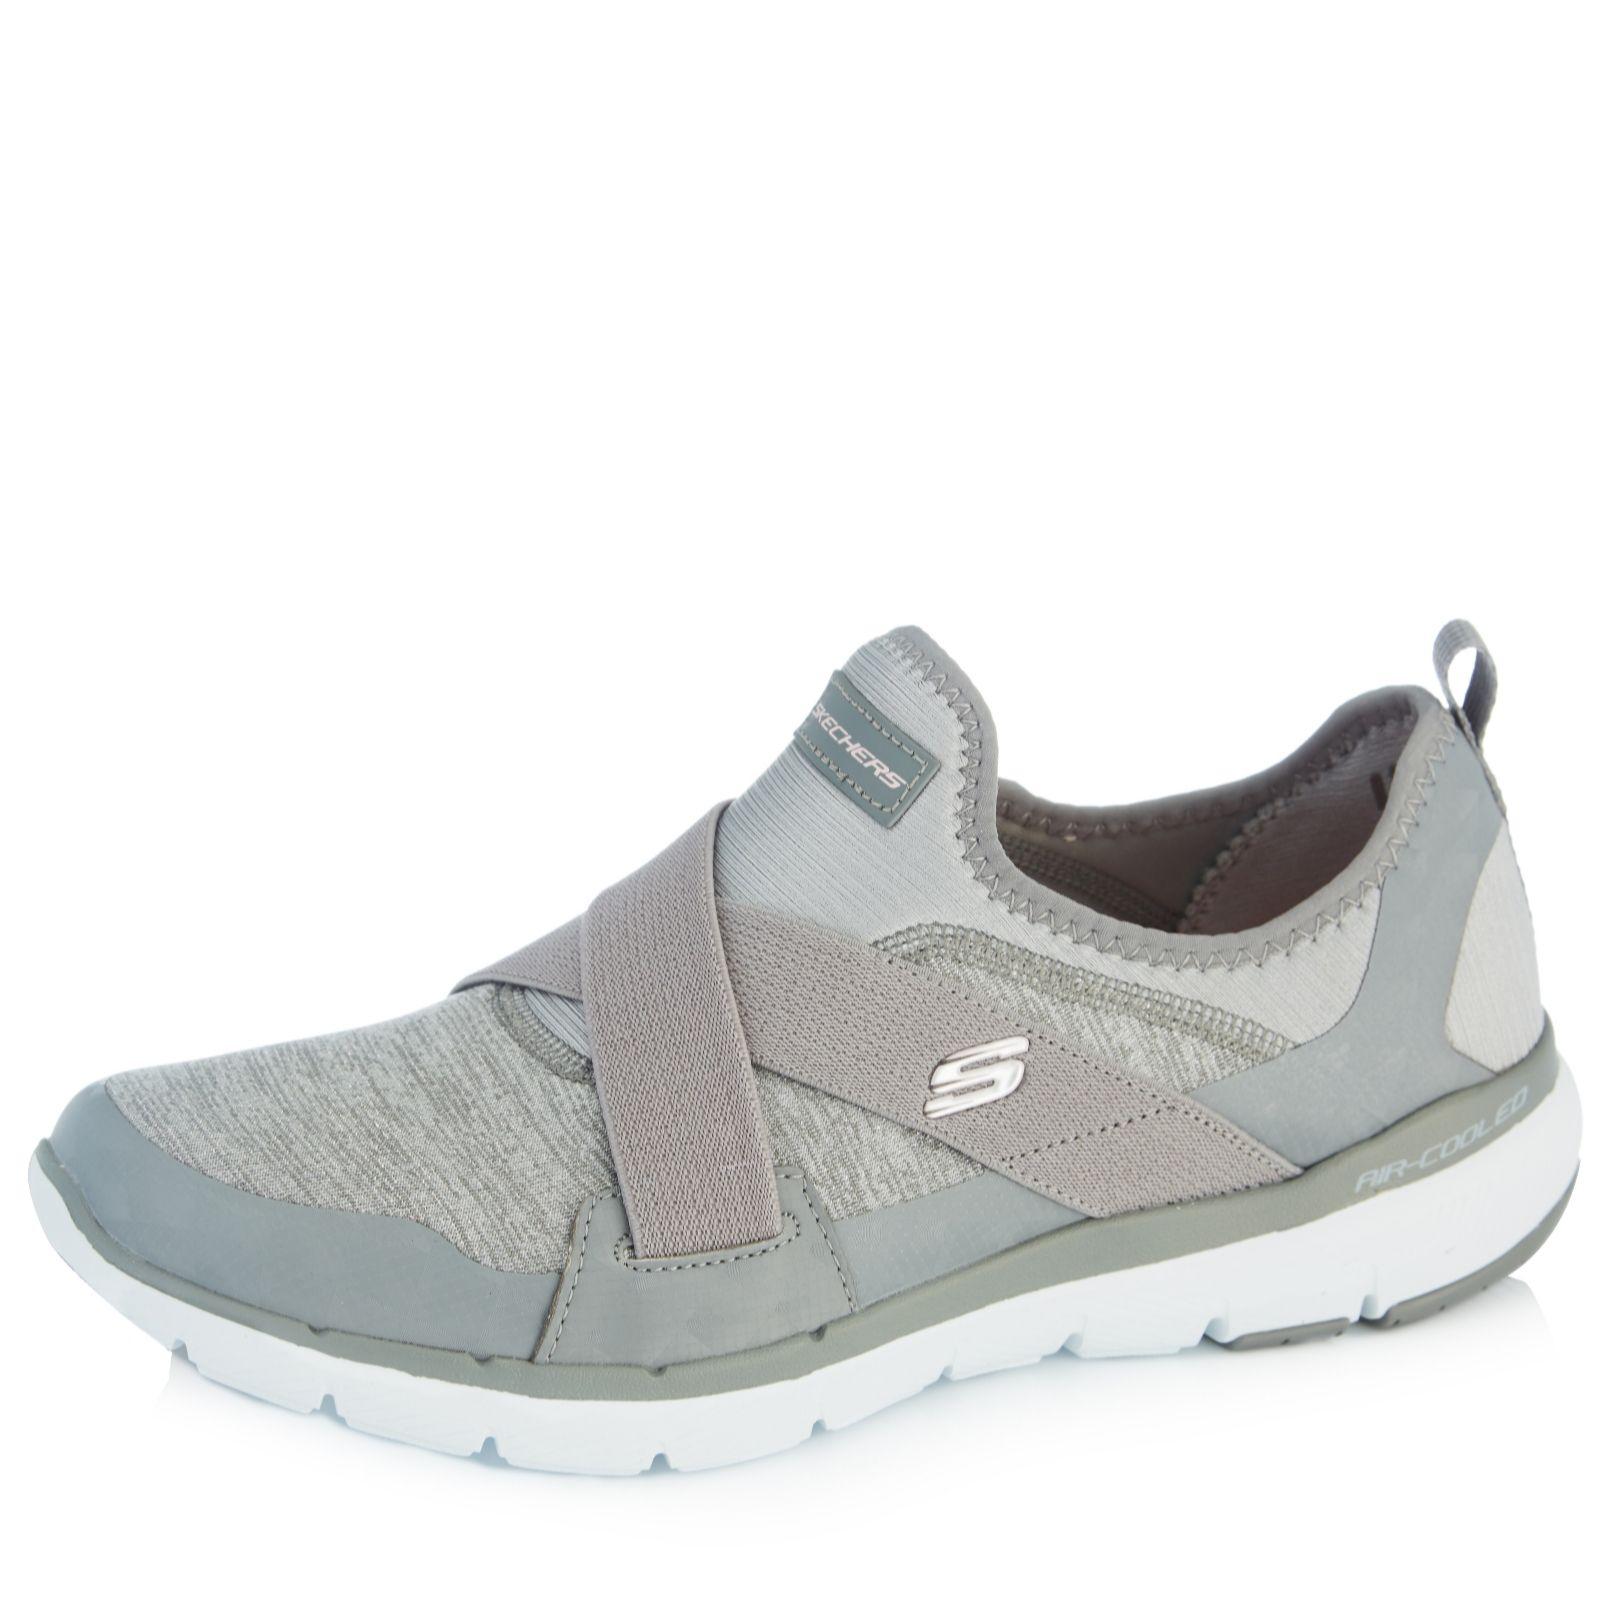 f72220ee481 Skechers Flex Appeal 3.0 Slip On Trainer - QVC UK